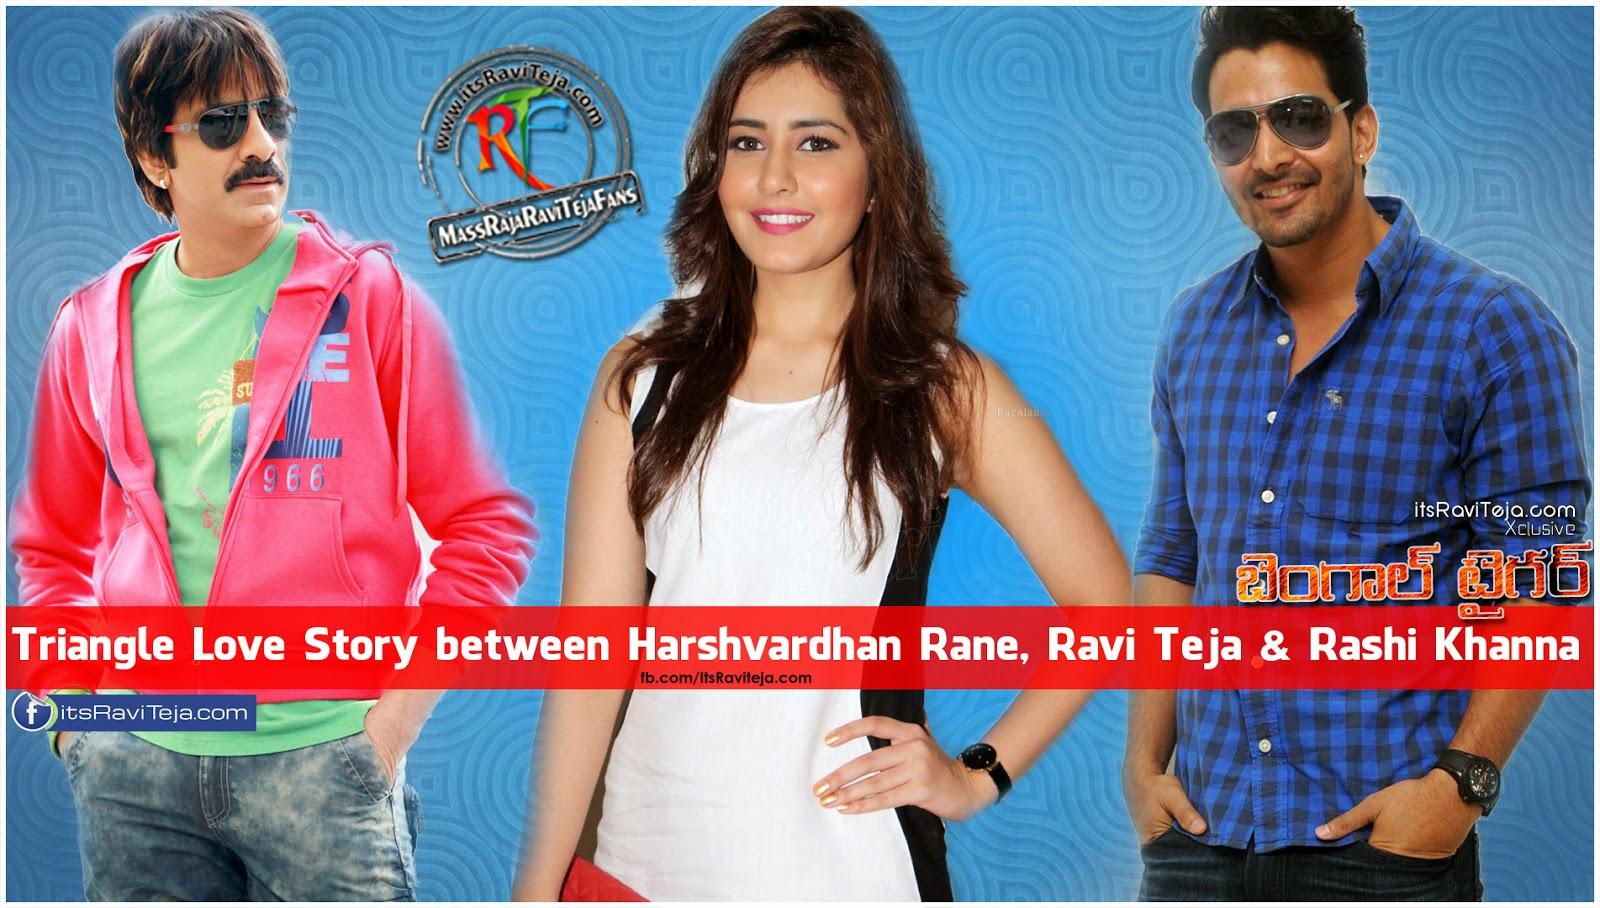 Triangle Love Story in between Ravi Teja Rashi Khanna and Harshvardhan Rane in Bengal Tiger Movie